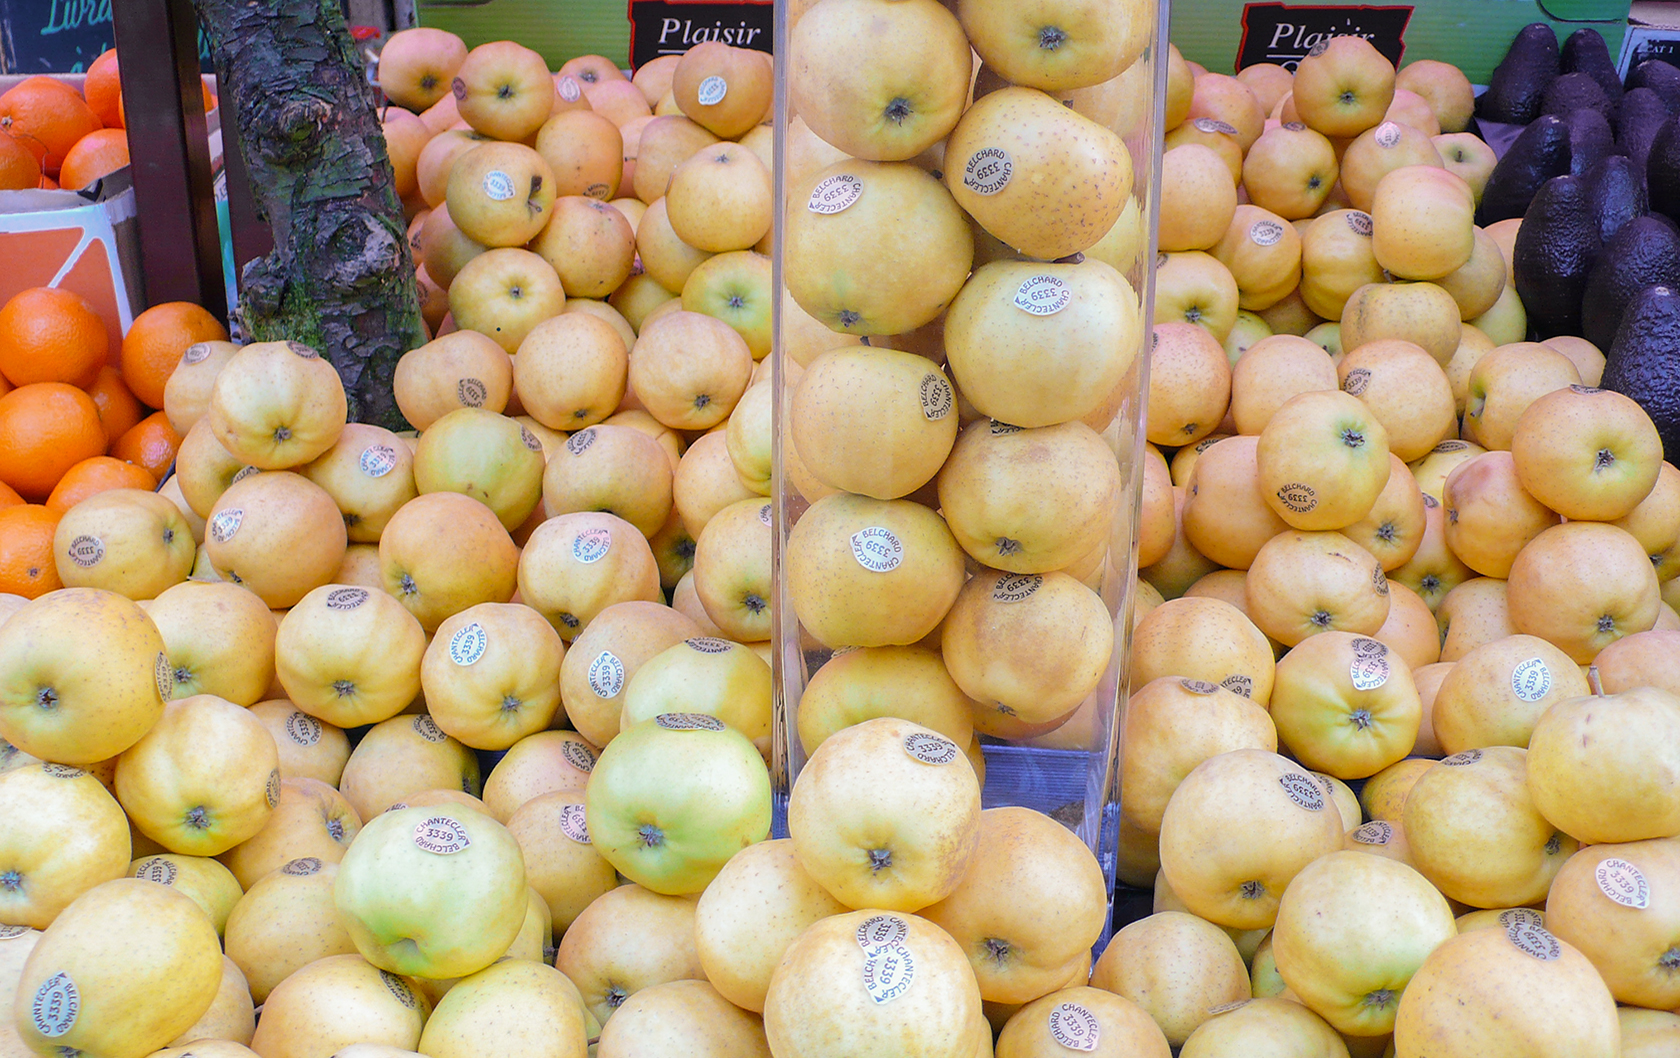 Chantecler apples at Paris market